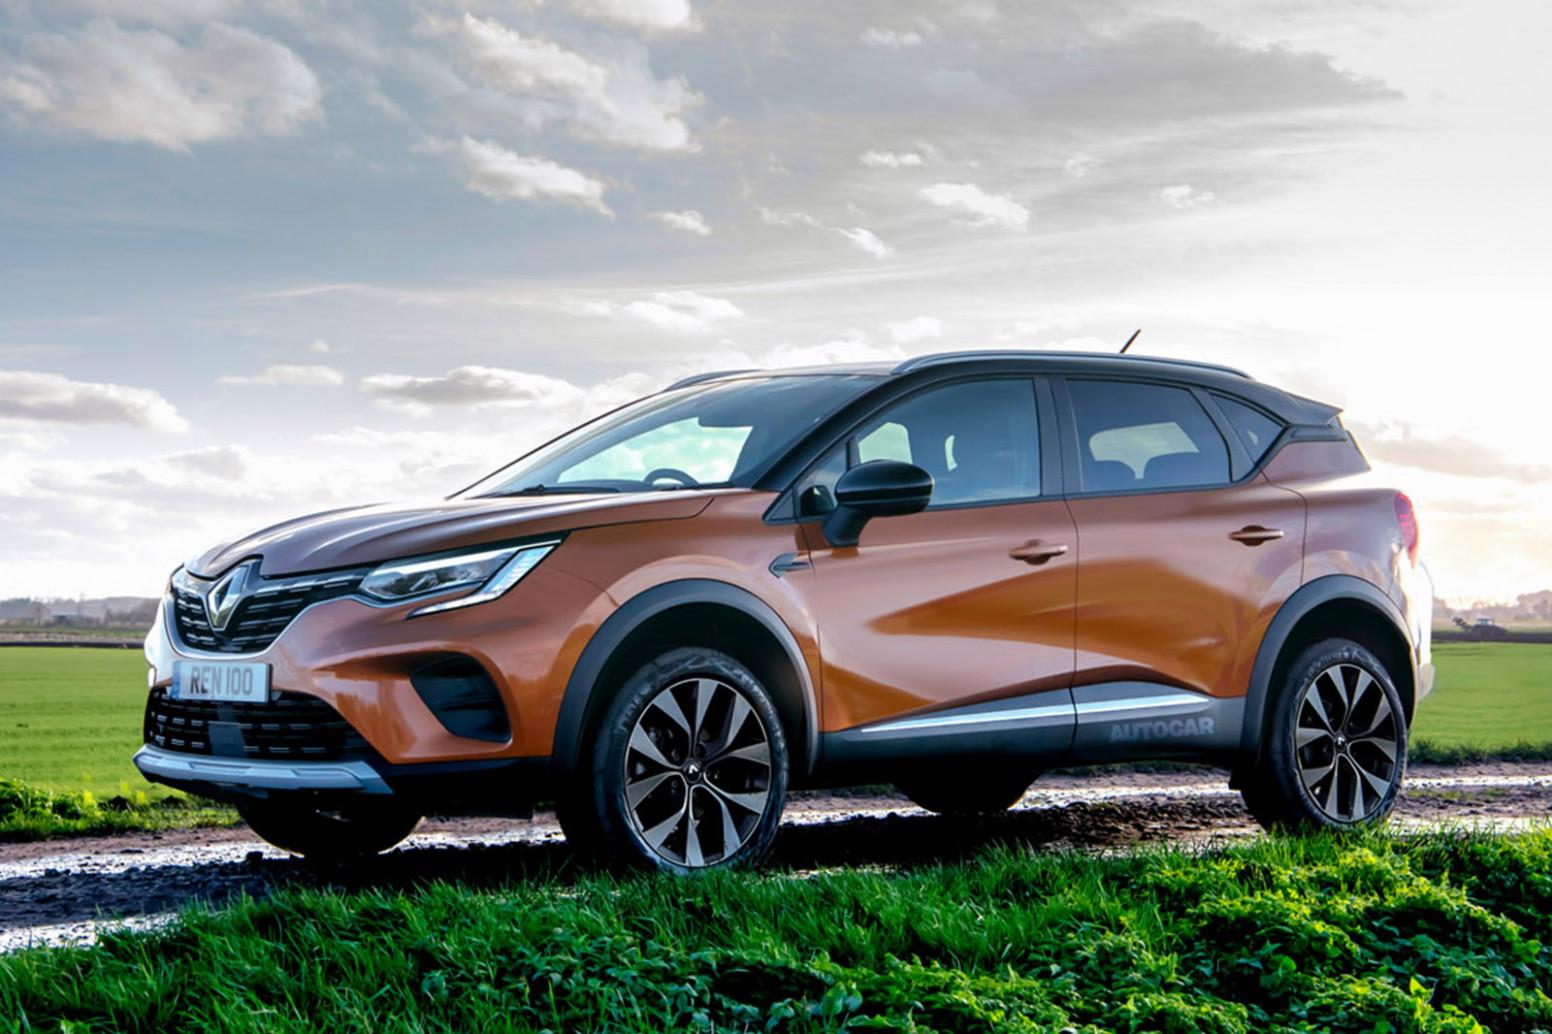 Release 2022 Renault Kadjar